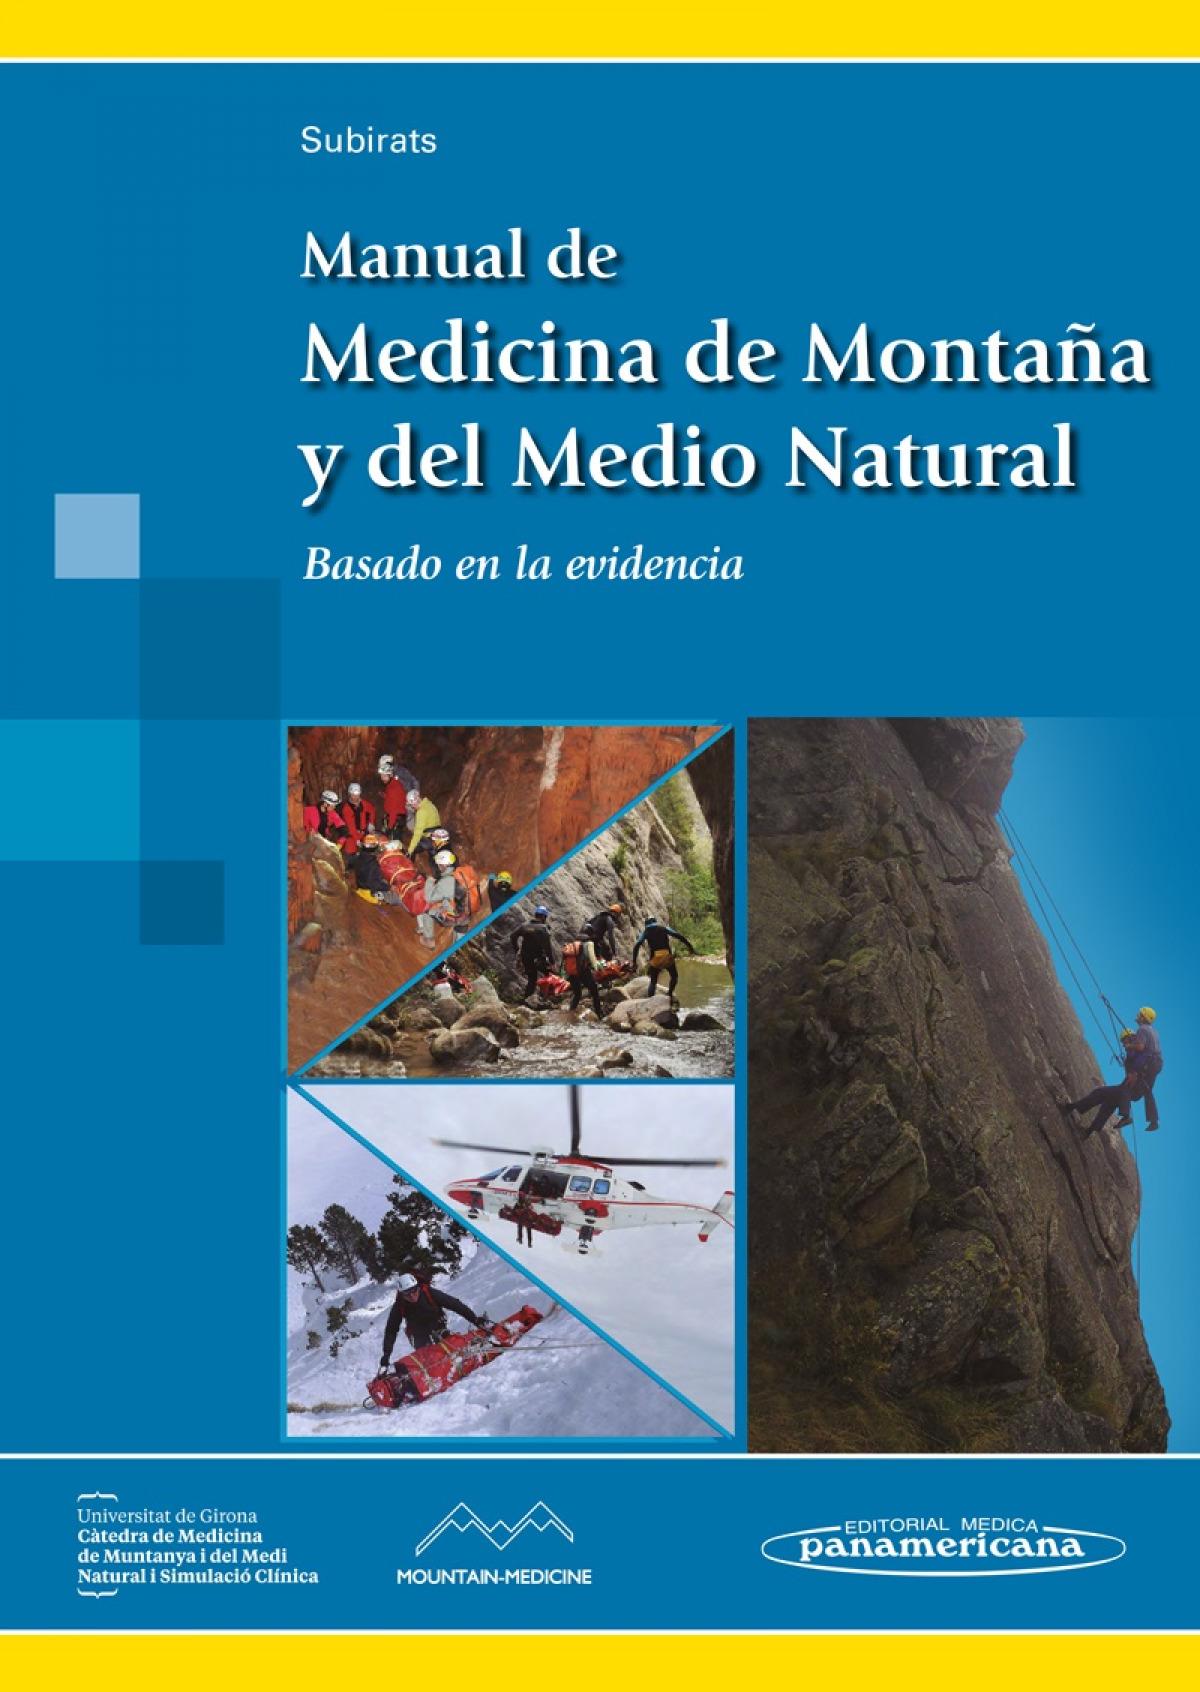 Manual Medc.Montaûa Med.Natural